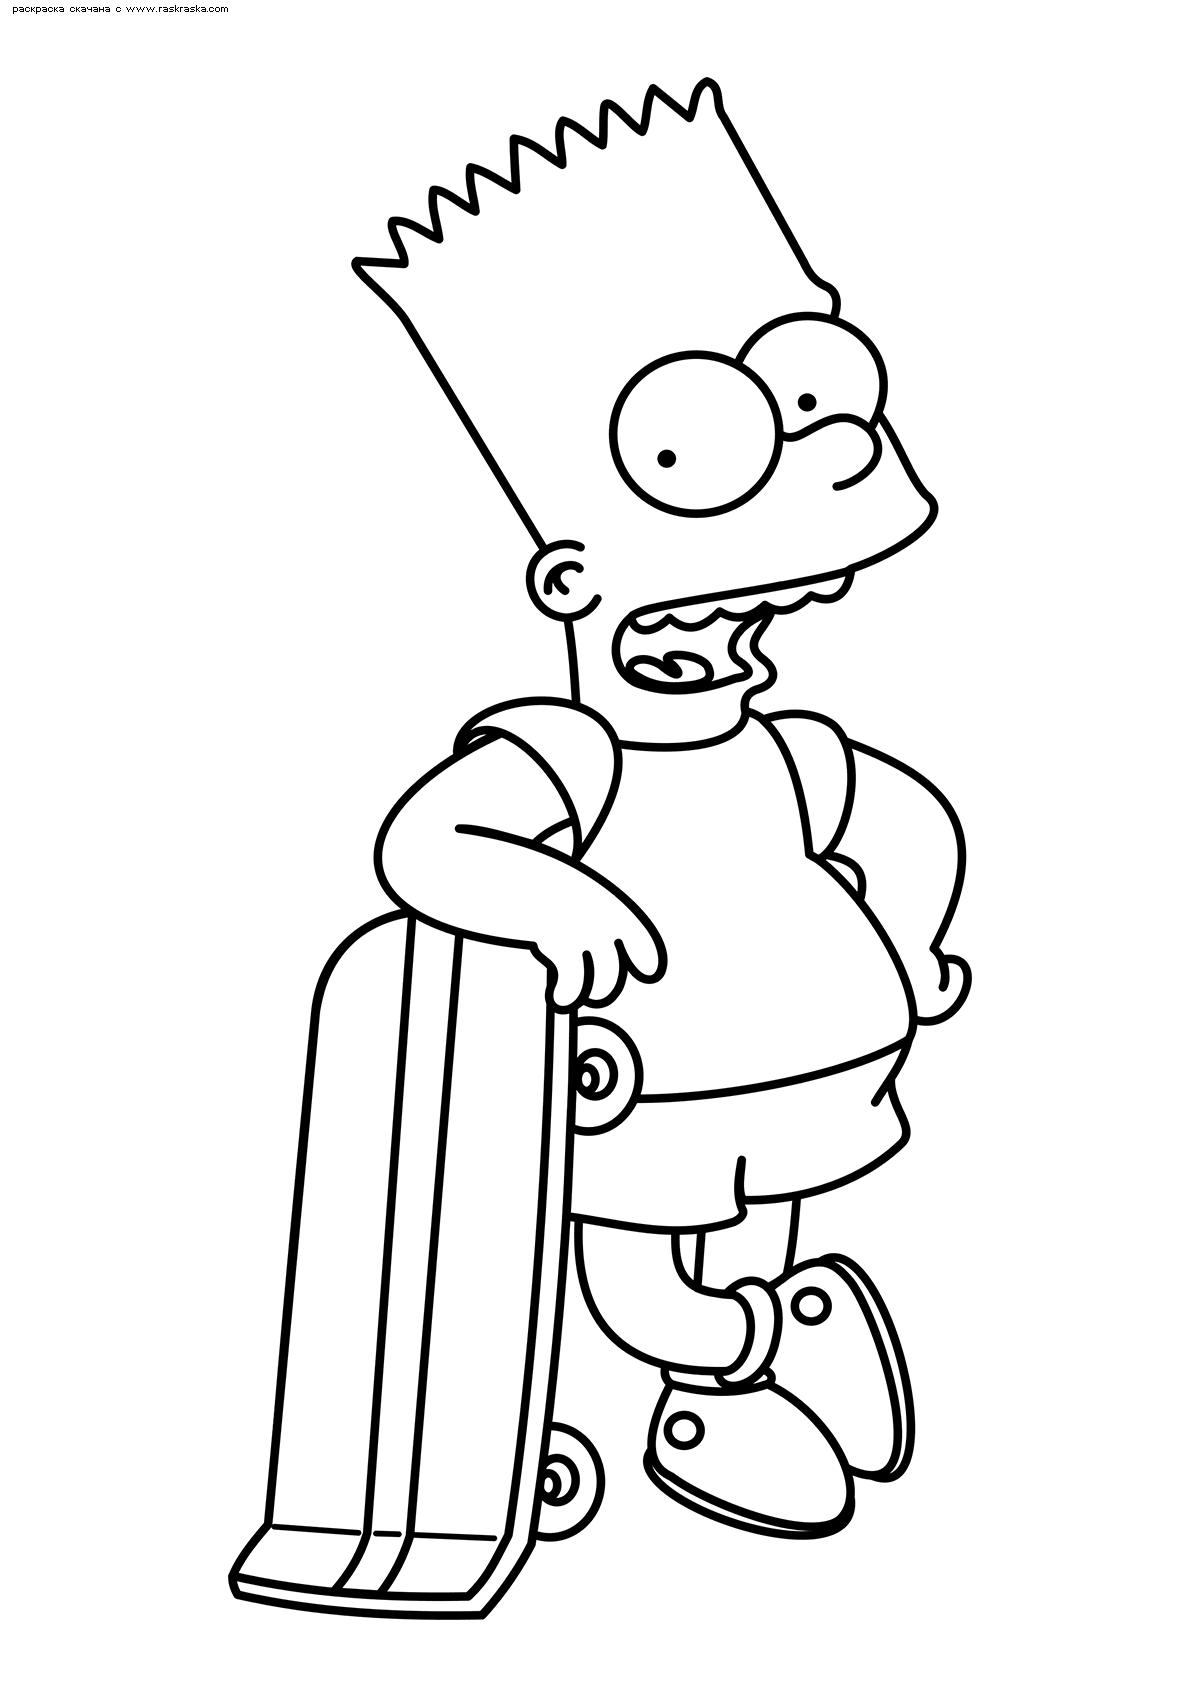 Раскраска Барт Симпсон. Раскраска Симпсоны